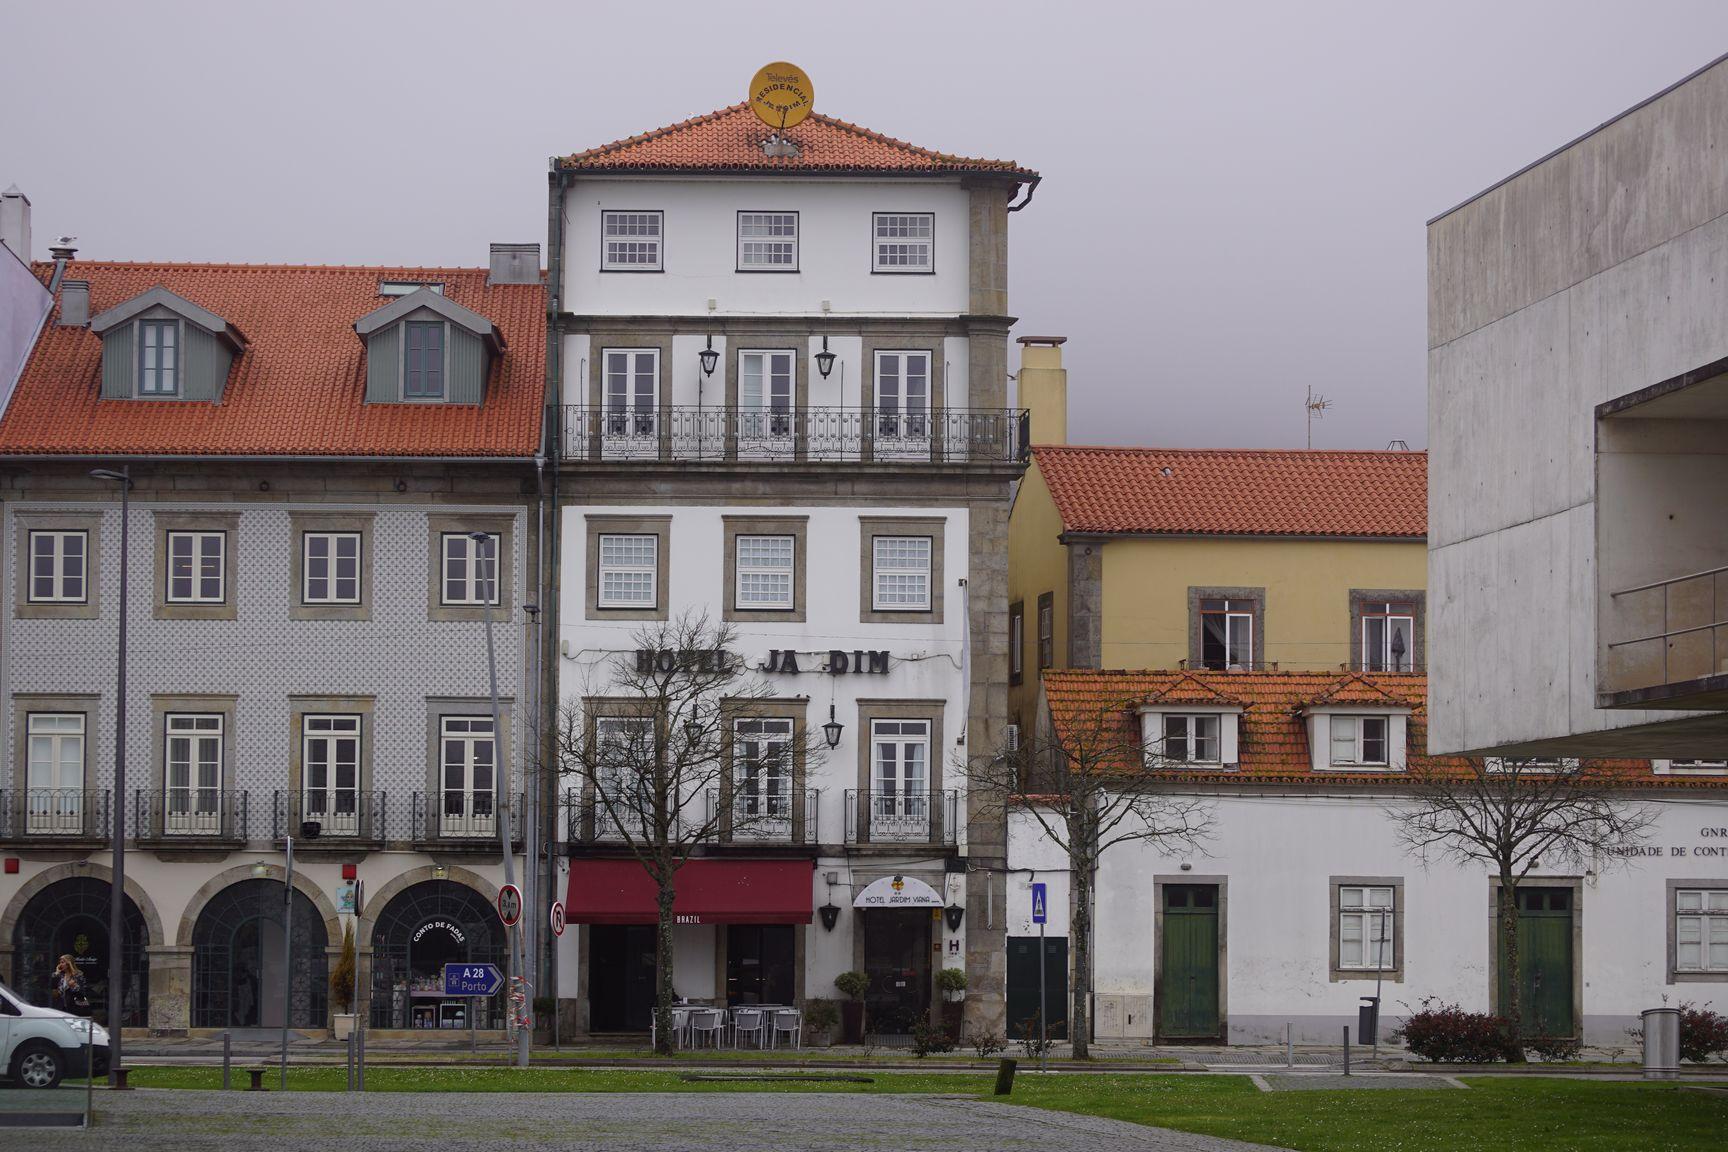 Viana do castelo mars 2020 (5)